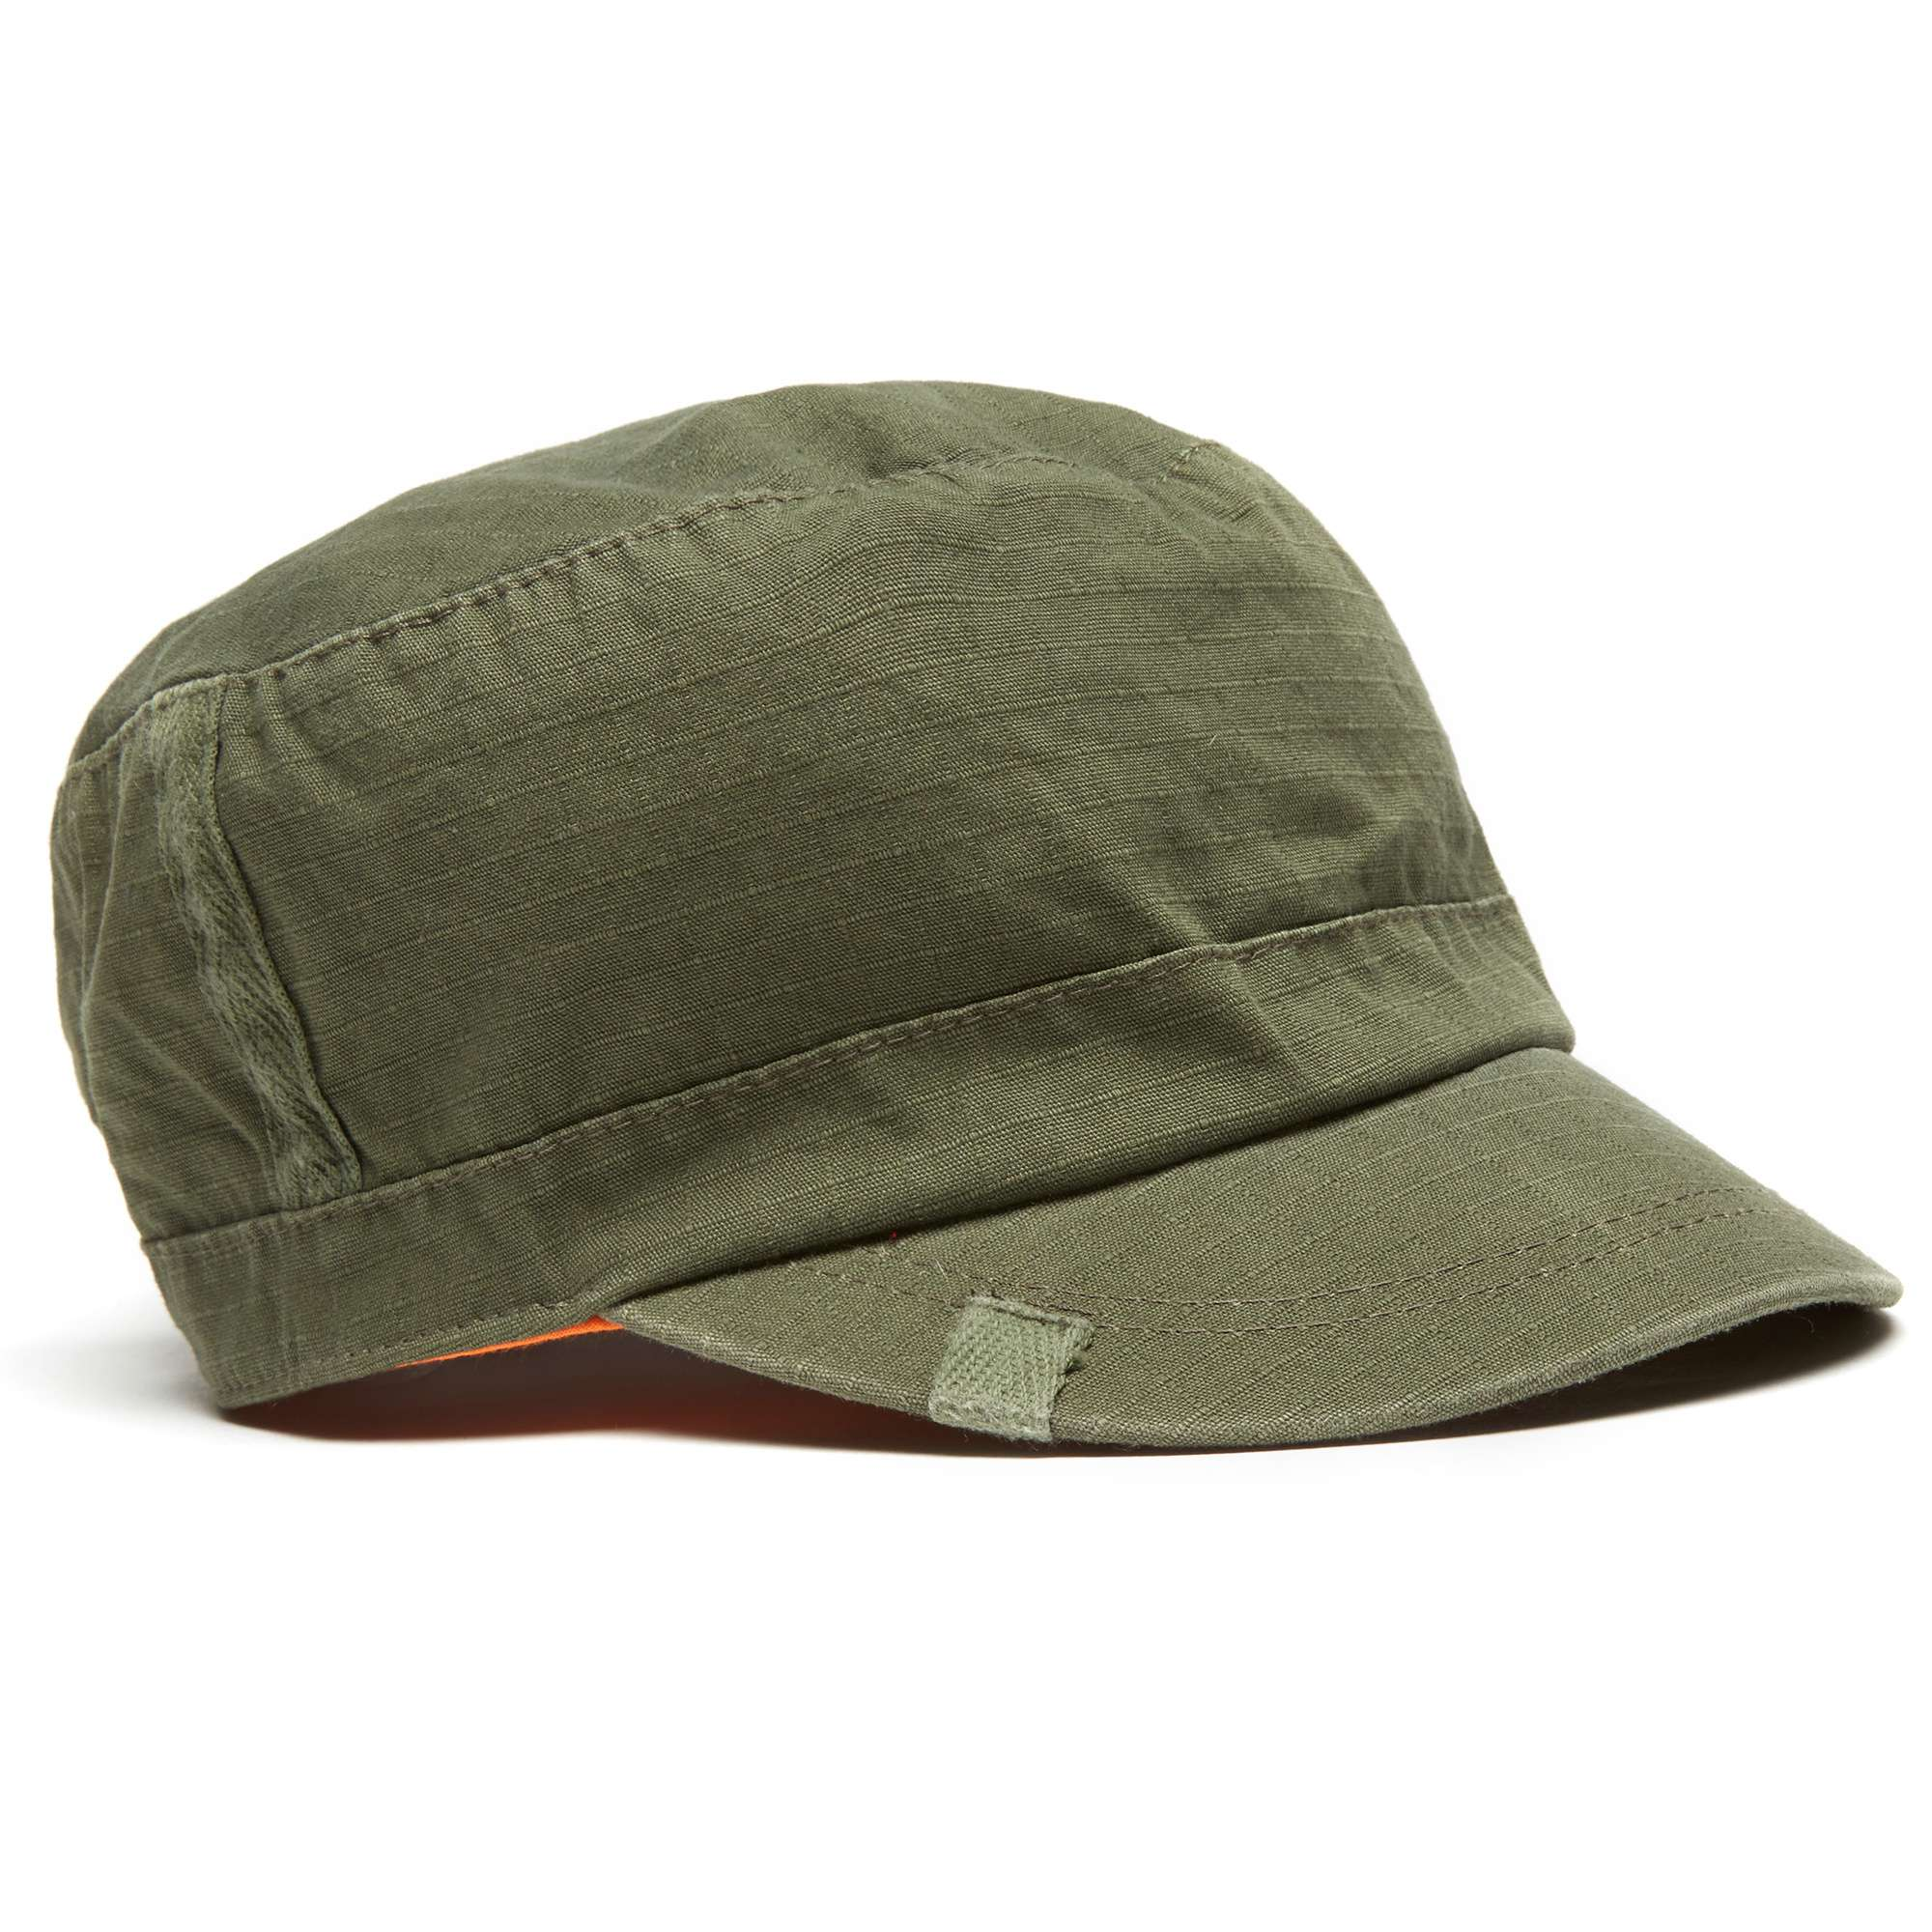 PETER STORM Boys' Ripstop Castro Hat